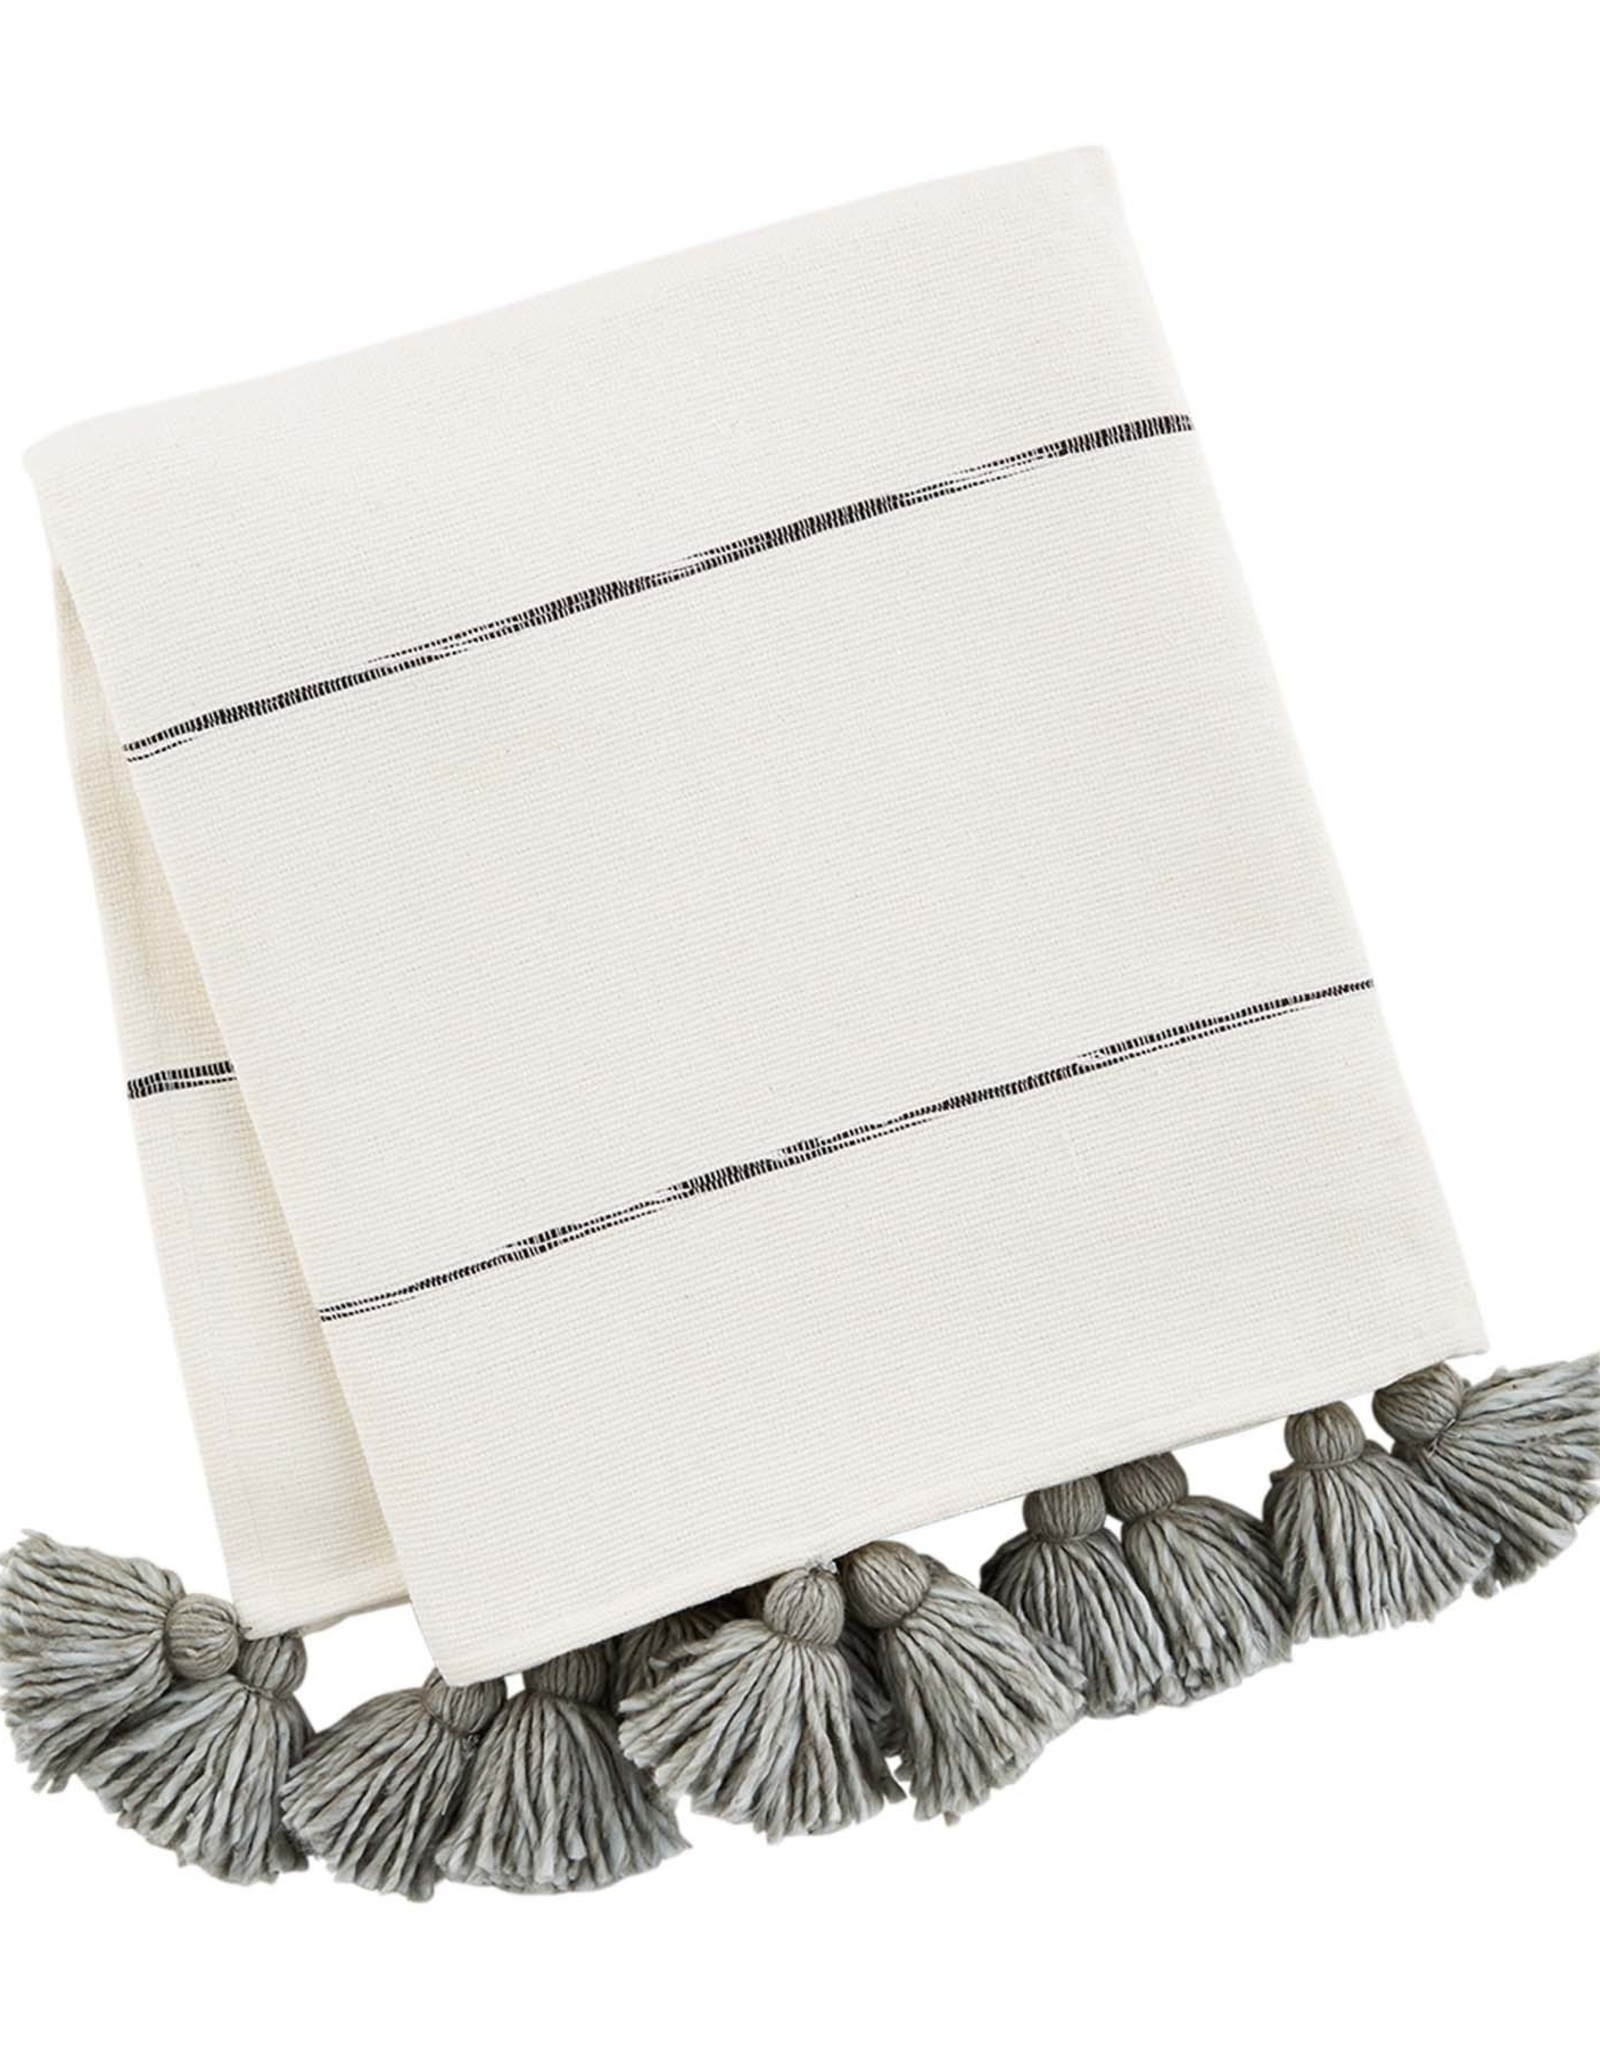 Tassel Throw - Gray